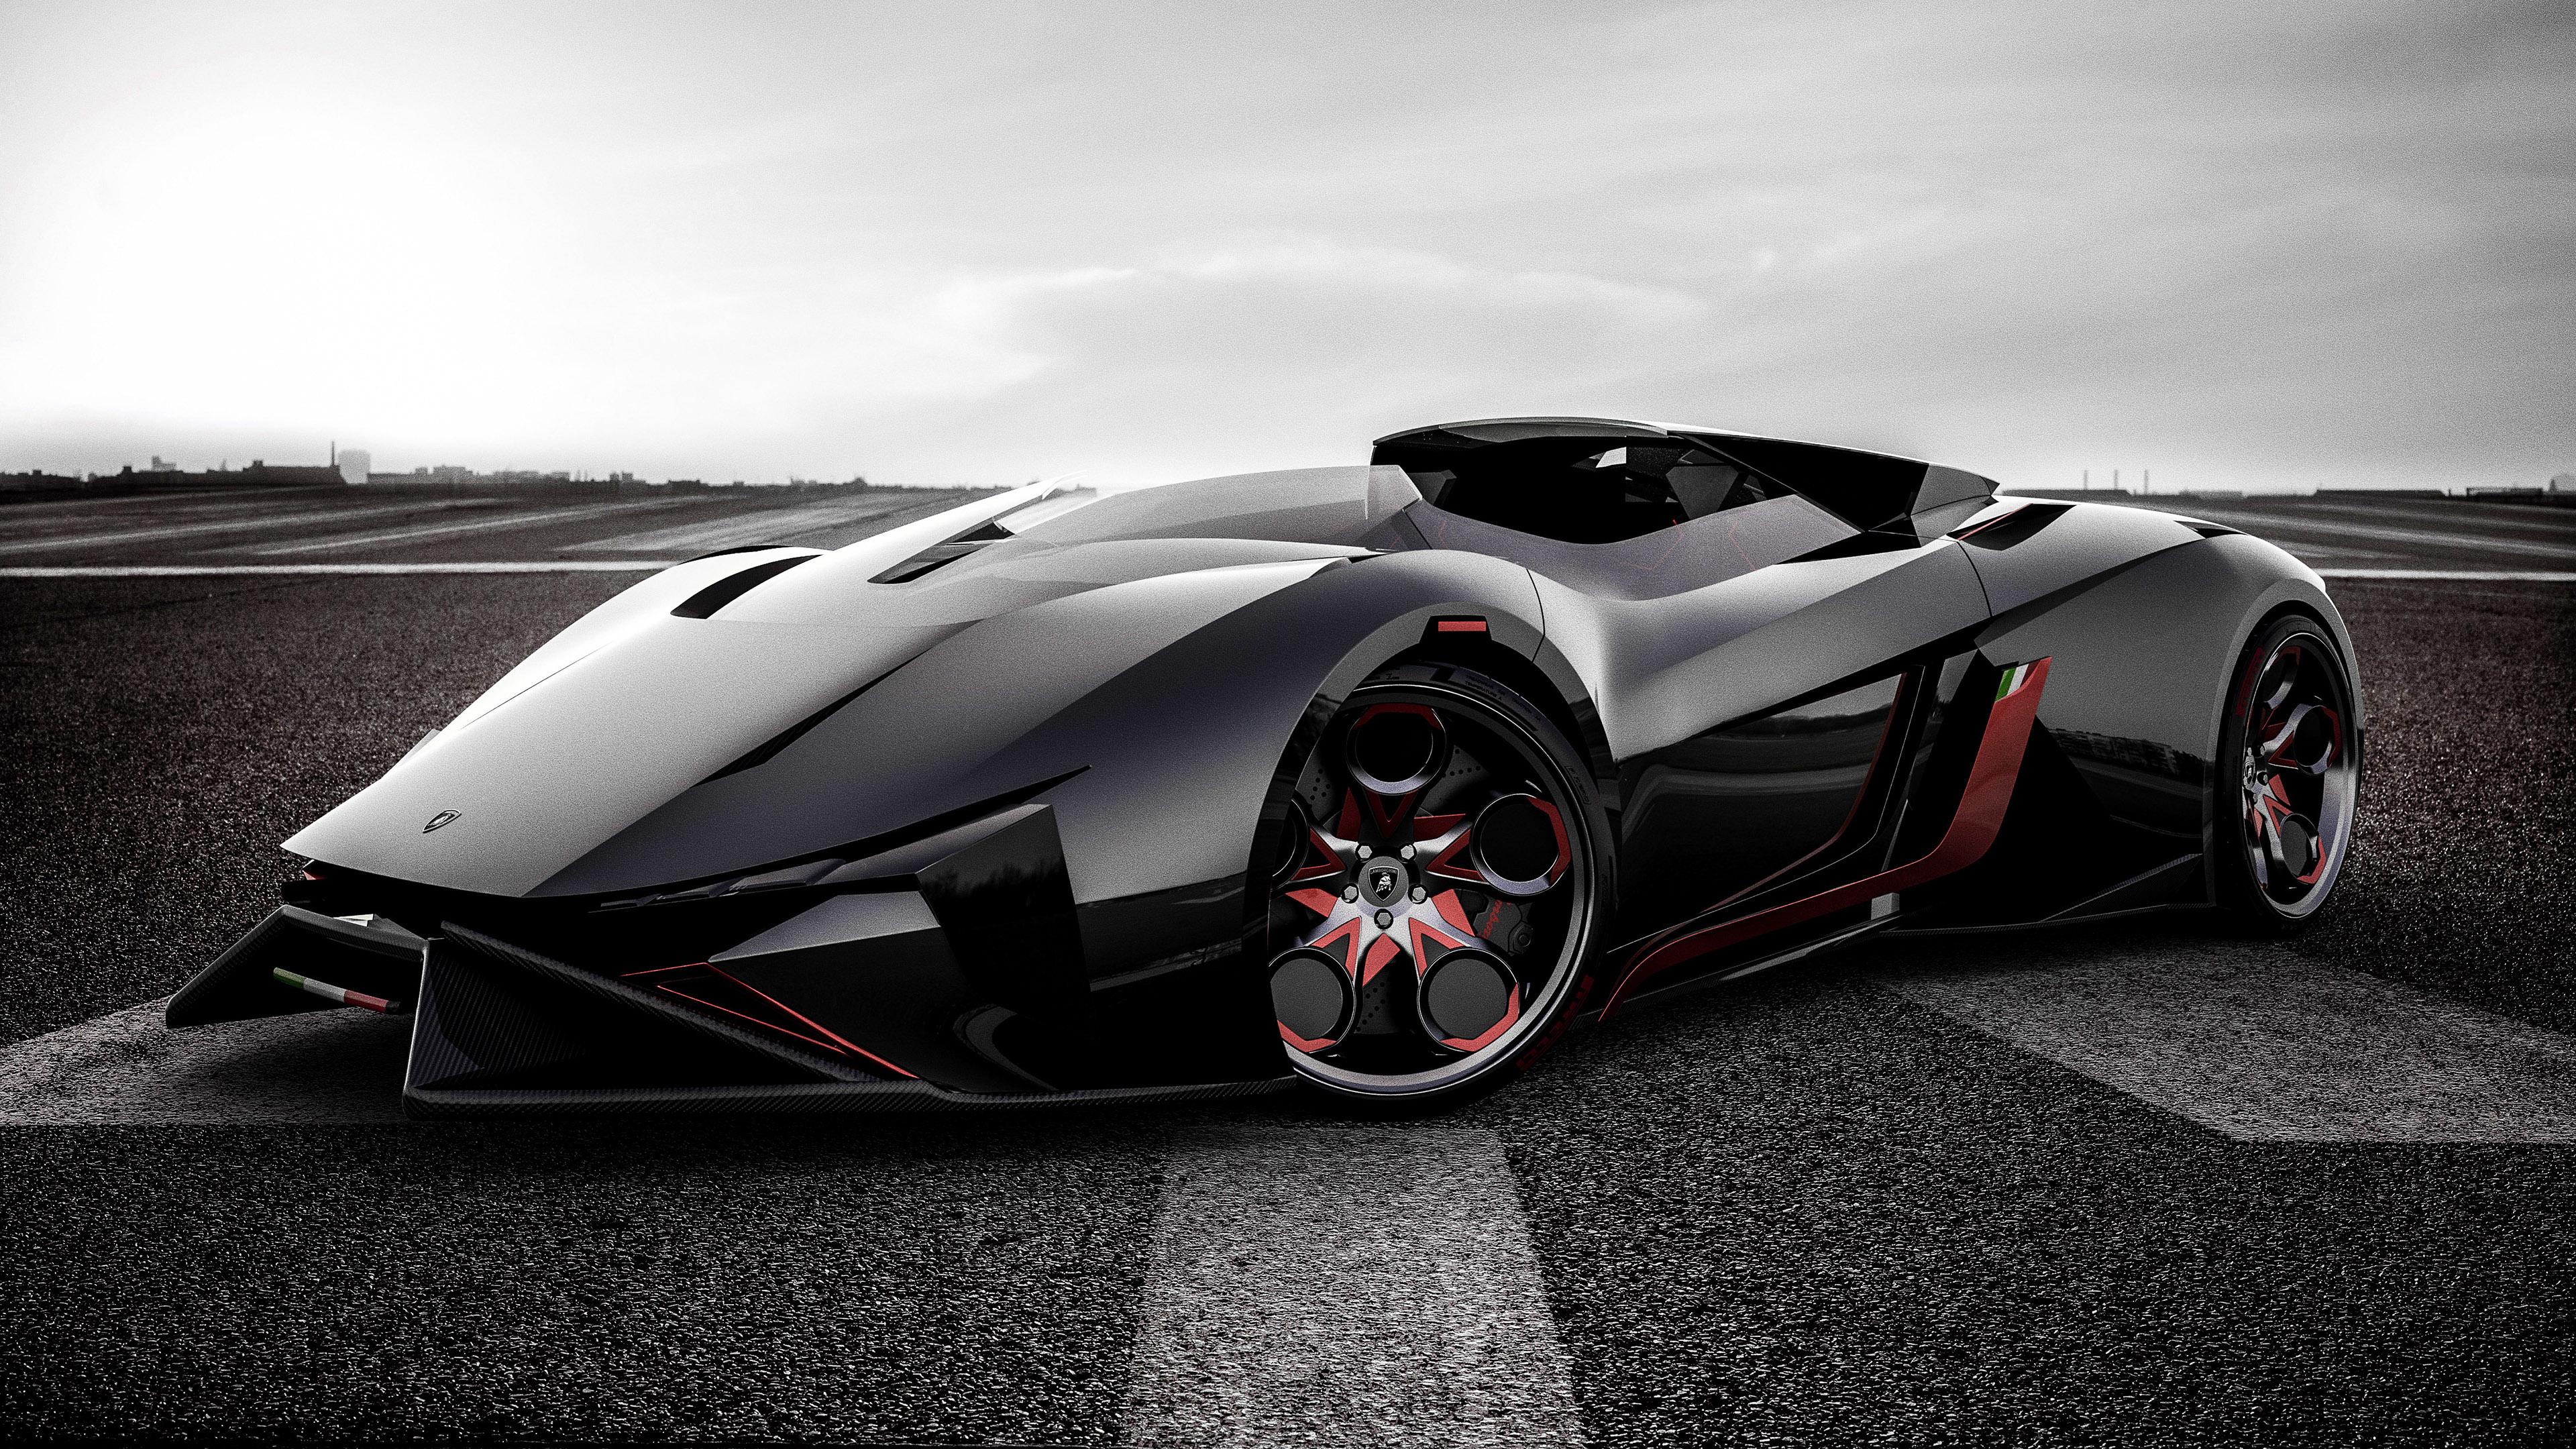 Lamborghini Diamante 4K Wallpaper | HD Car Wallpapers | ID ...